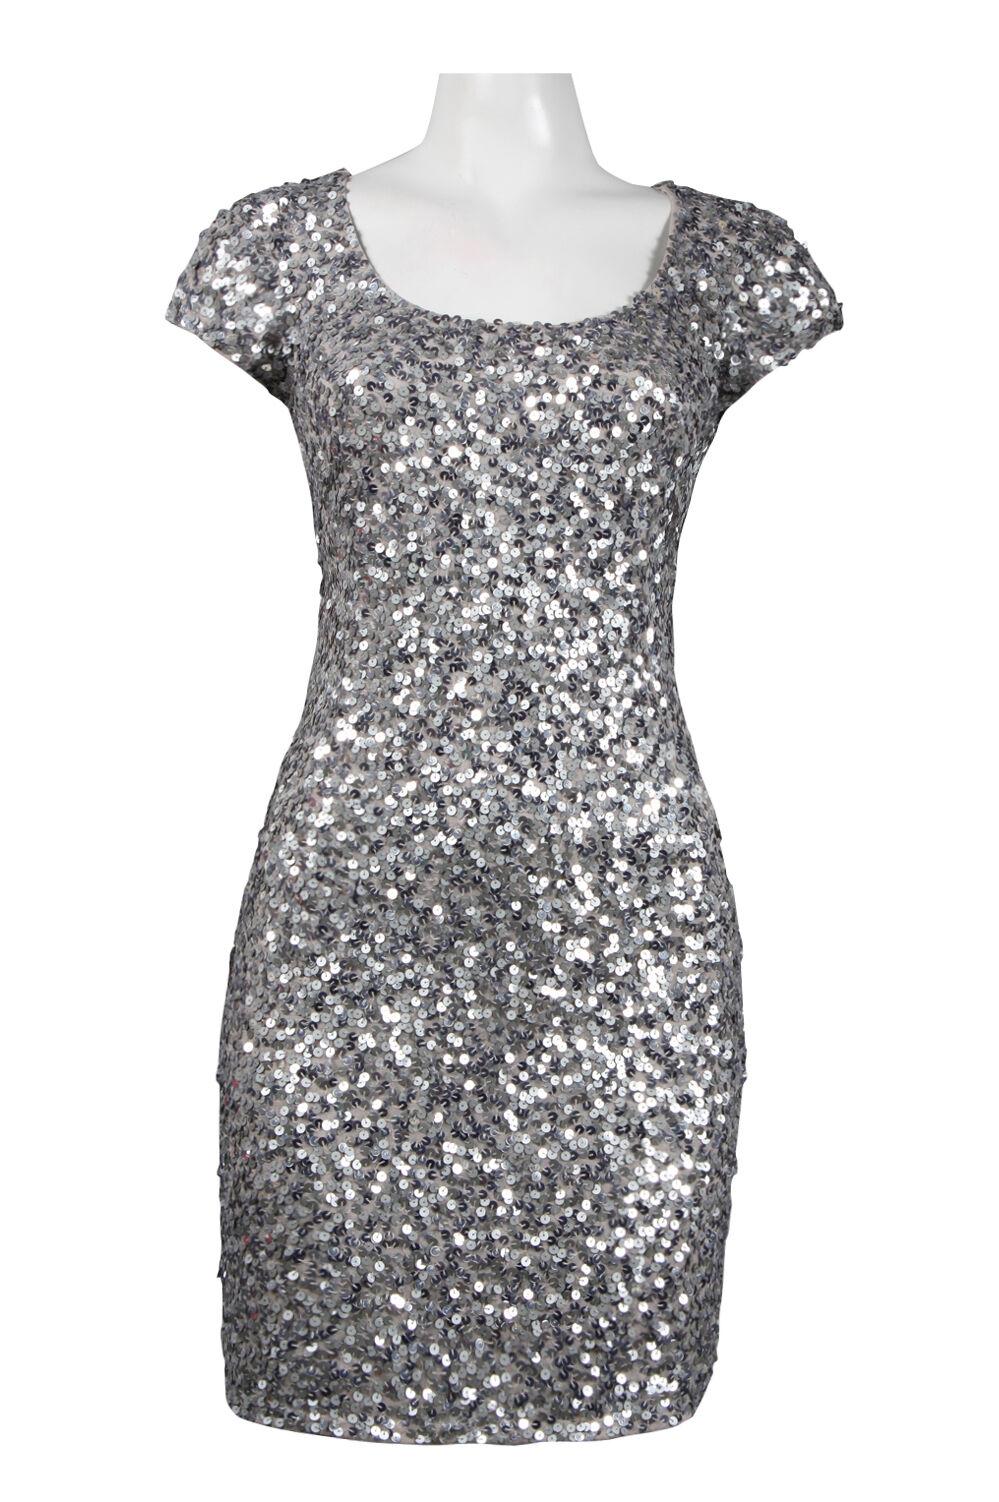 NWOT grått Adrianna Papell Embellished Sheath sequins Klänningsstorlek P10